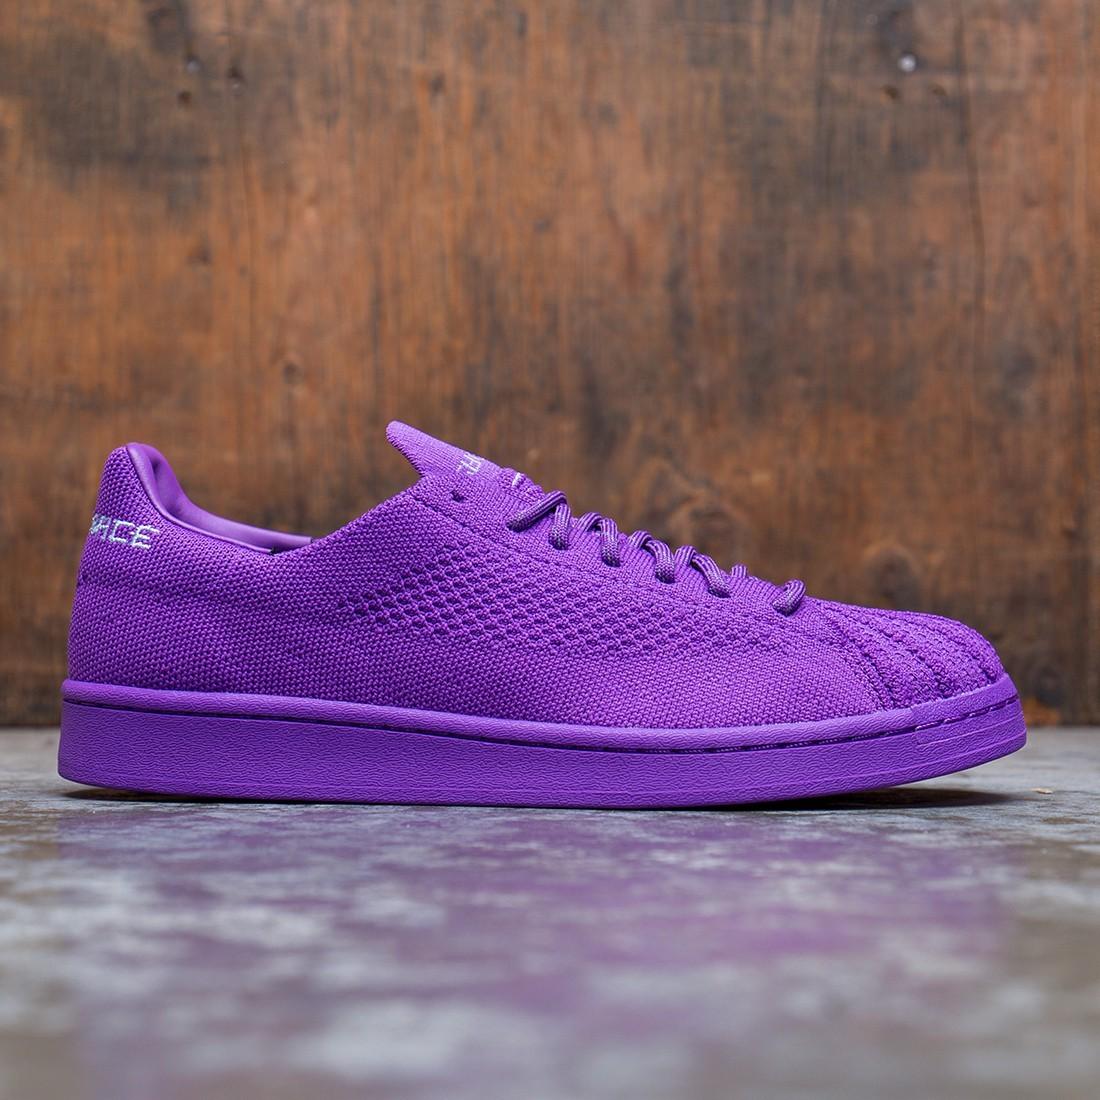 Adidas x Pharrell Williams Men Superstar Primeknit (purple / active purple / grey two / night red)